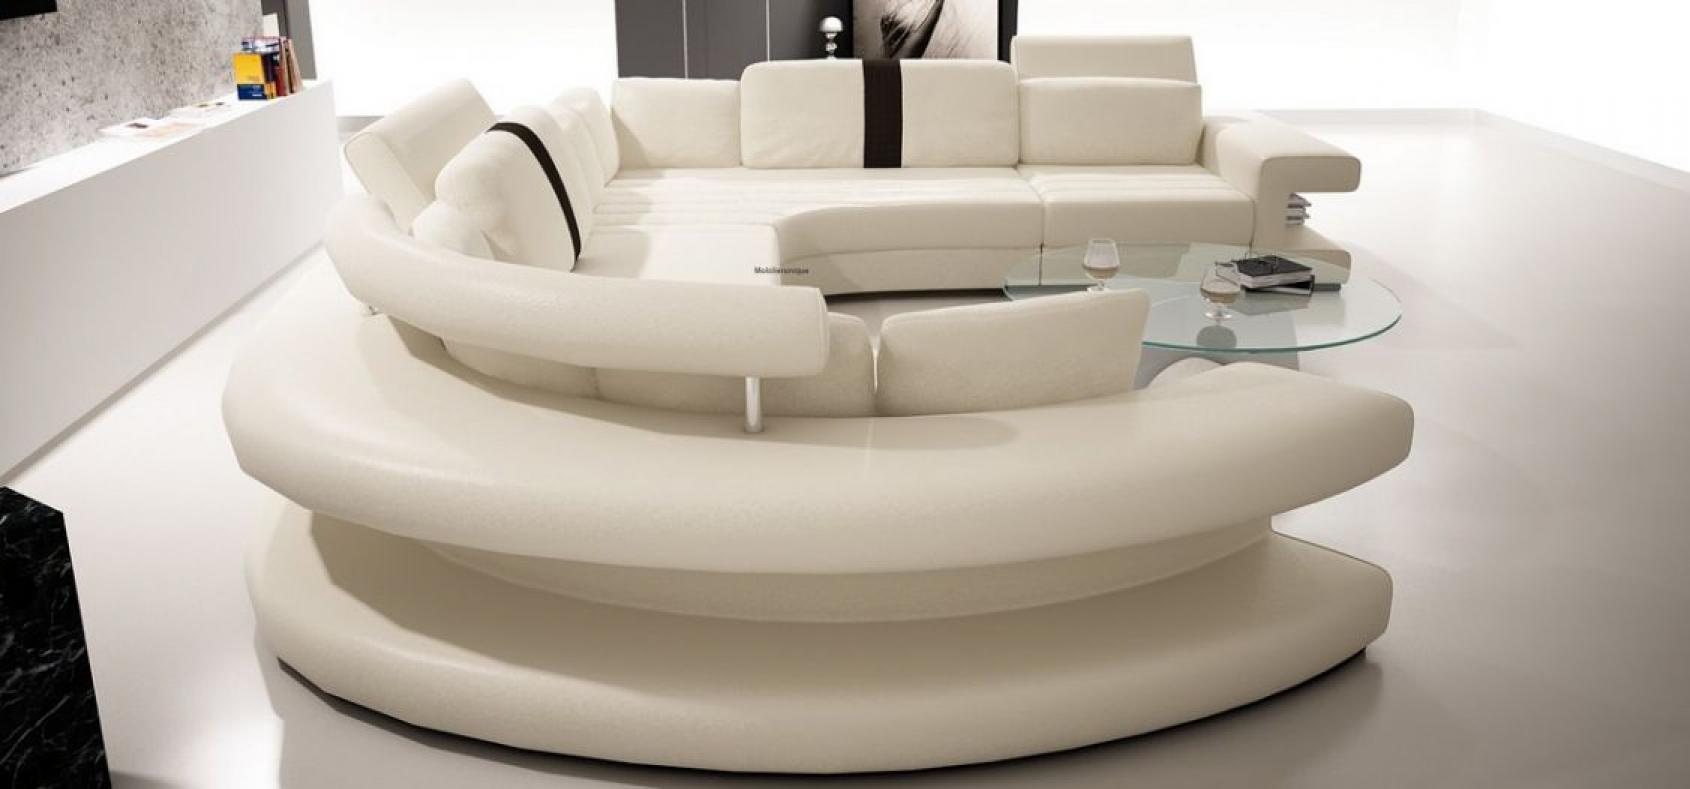 photos canap arrondi panoramique. Black Bedroom Furniture Sets. Home Design Ideas